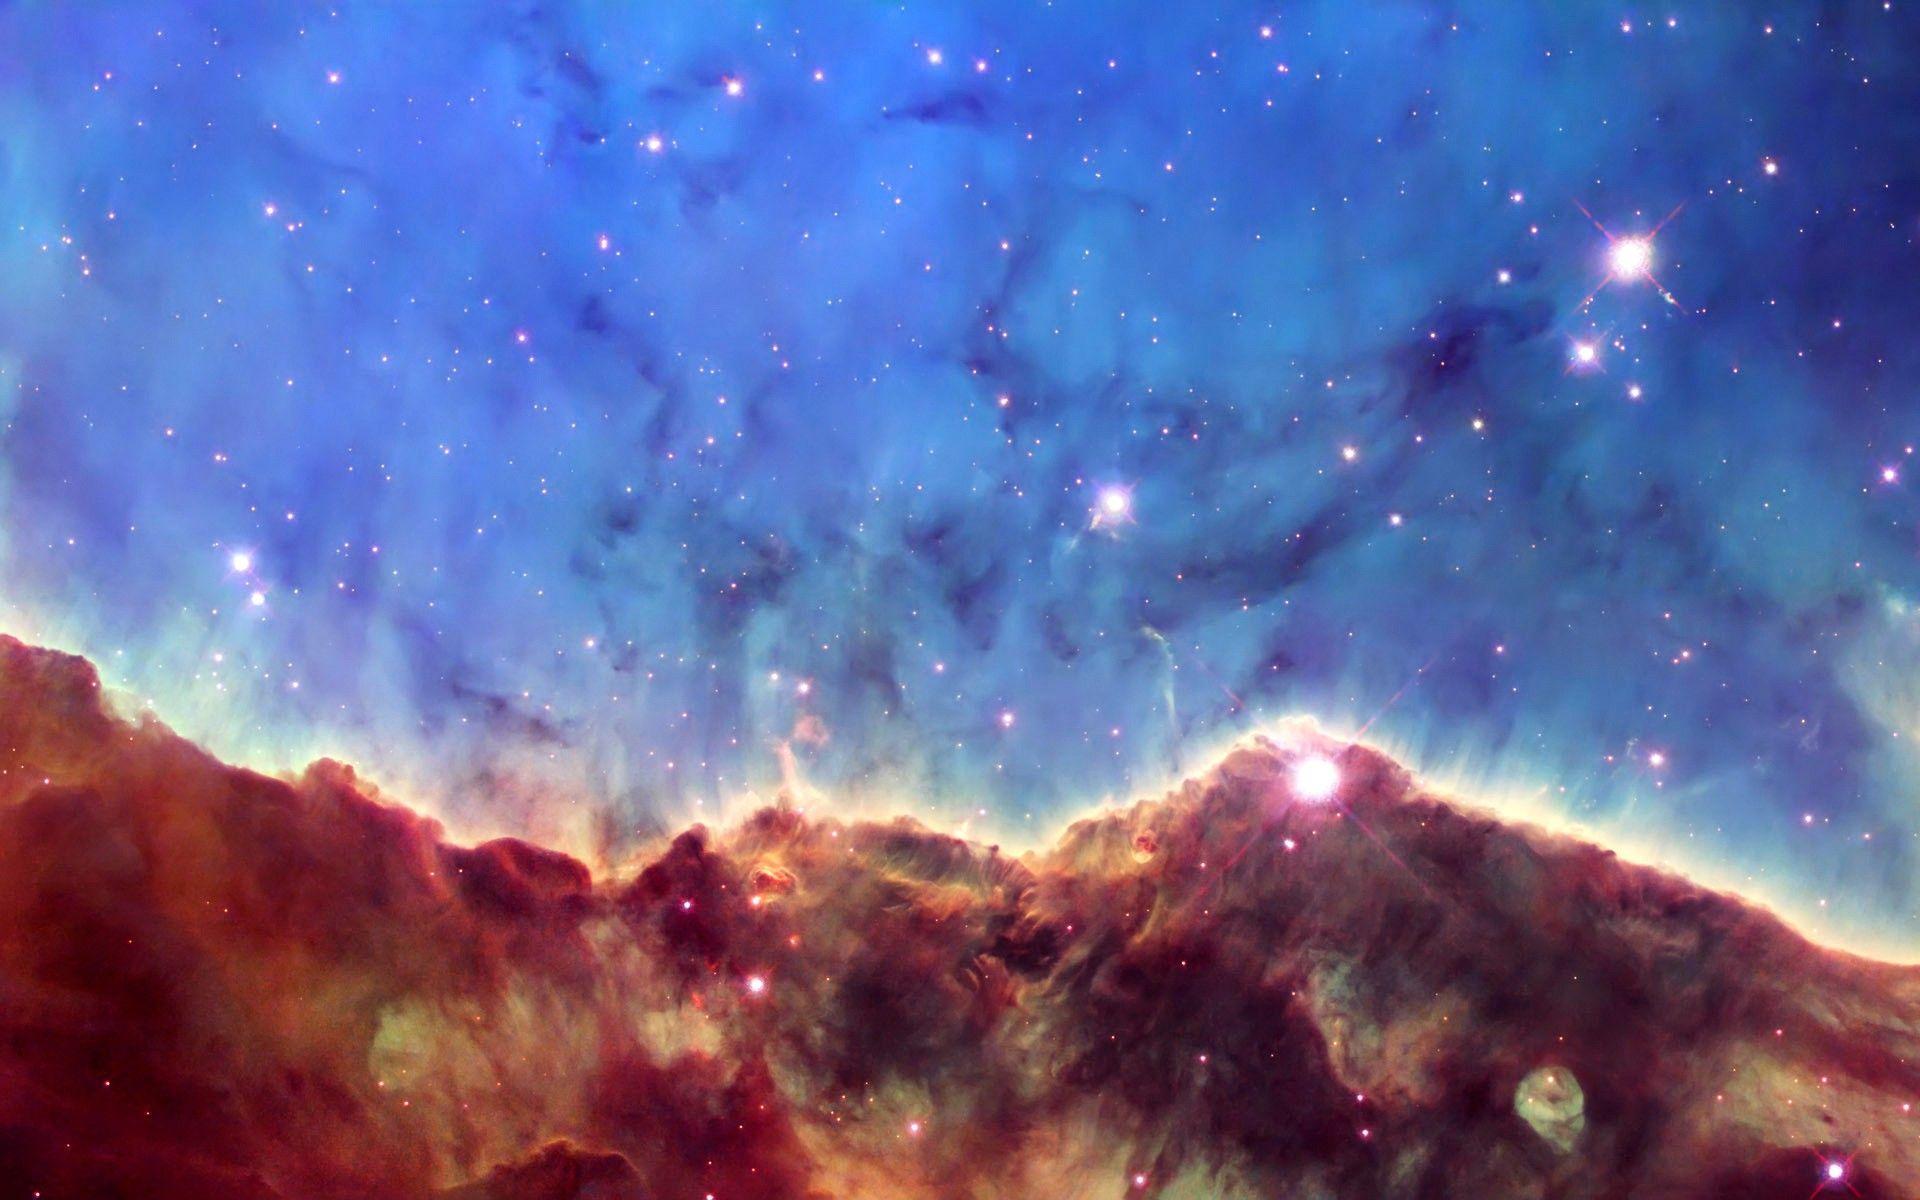 Hubble 4k wallpapers top free hubble 4k backgrounds - Hubble space images wallpaper ...